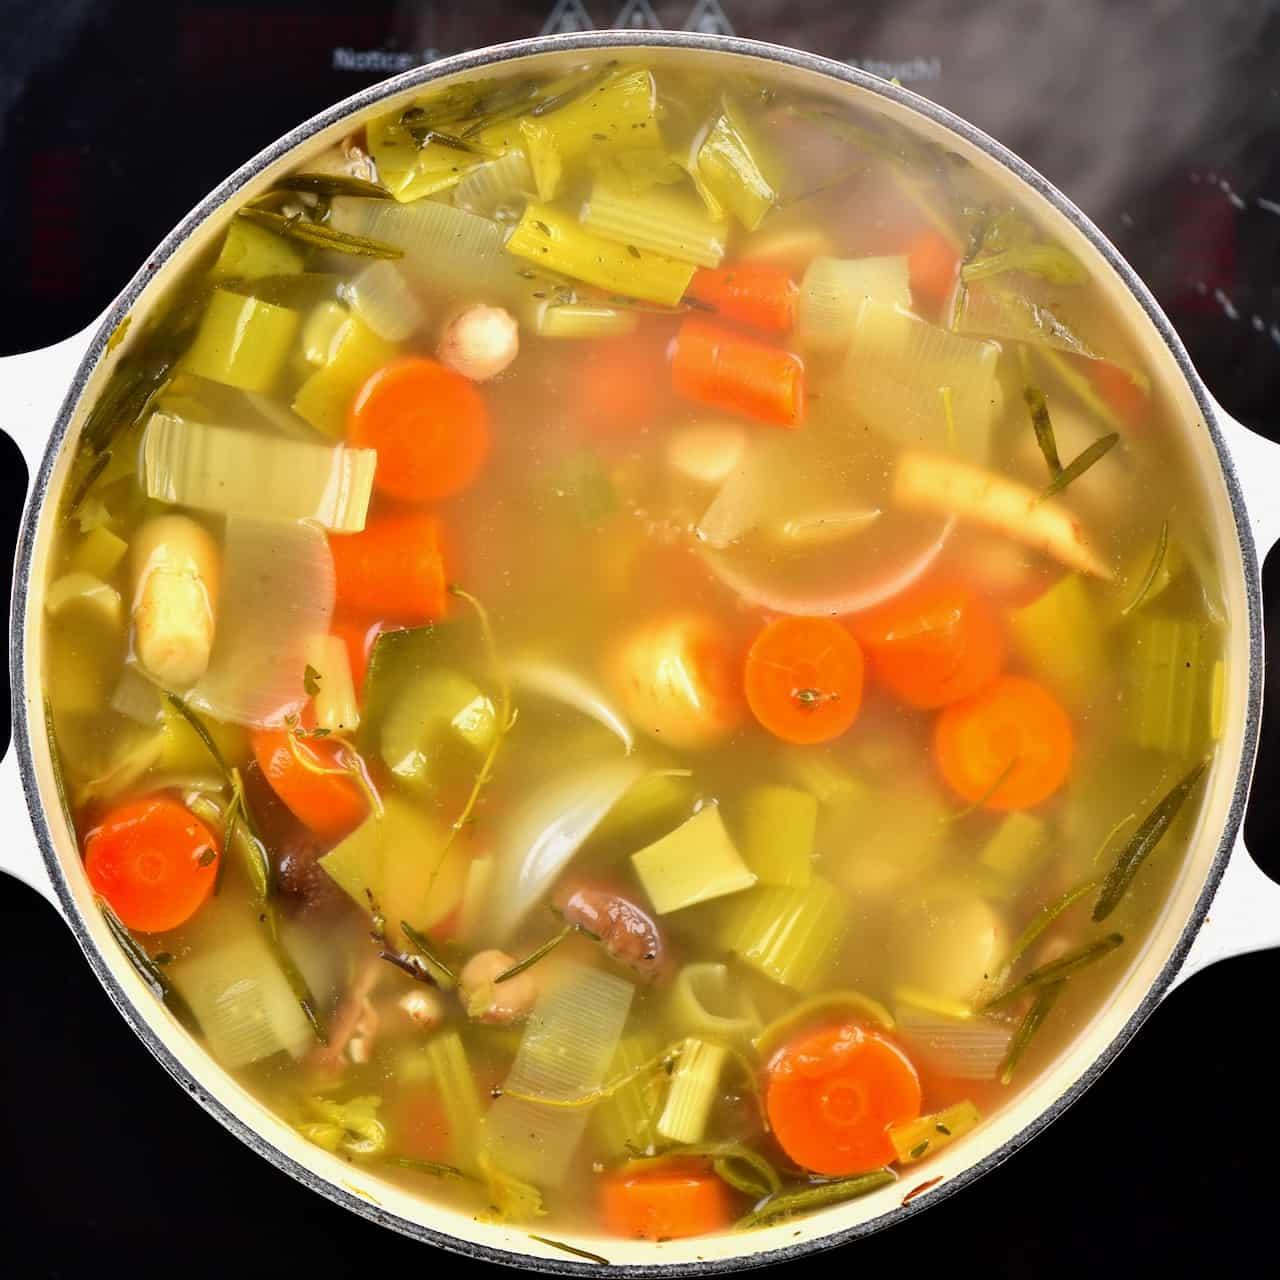 boiling vegetable stock